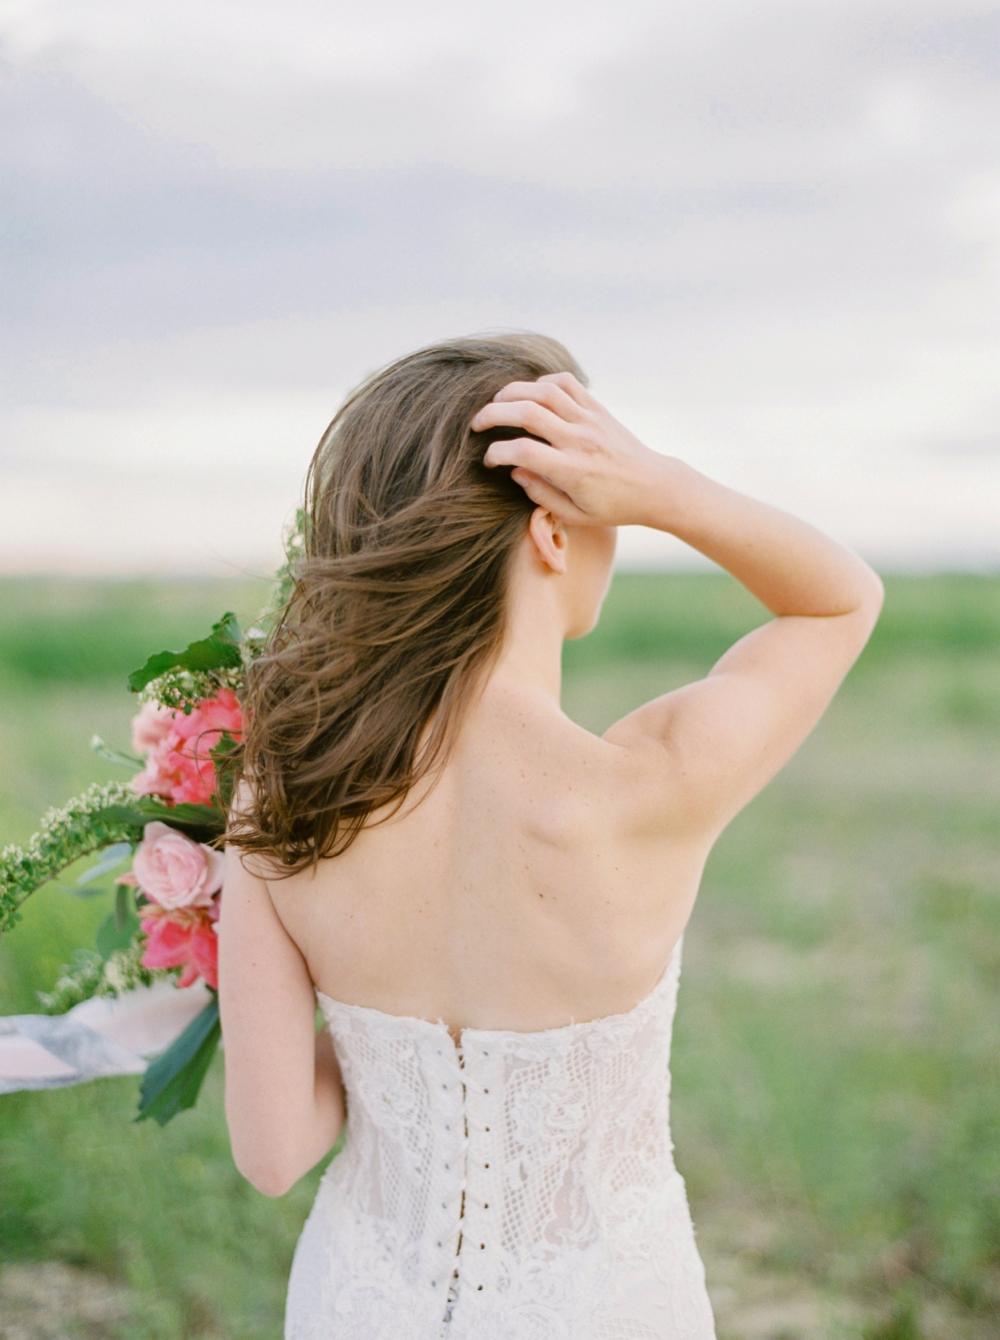 Edmonton wedding photographers | pink bridal bouquet | galia lahav wedding dress inspiration | Justine Milton fine art film wedding photographer